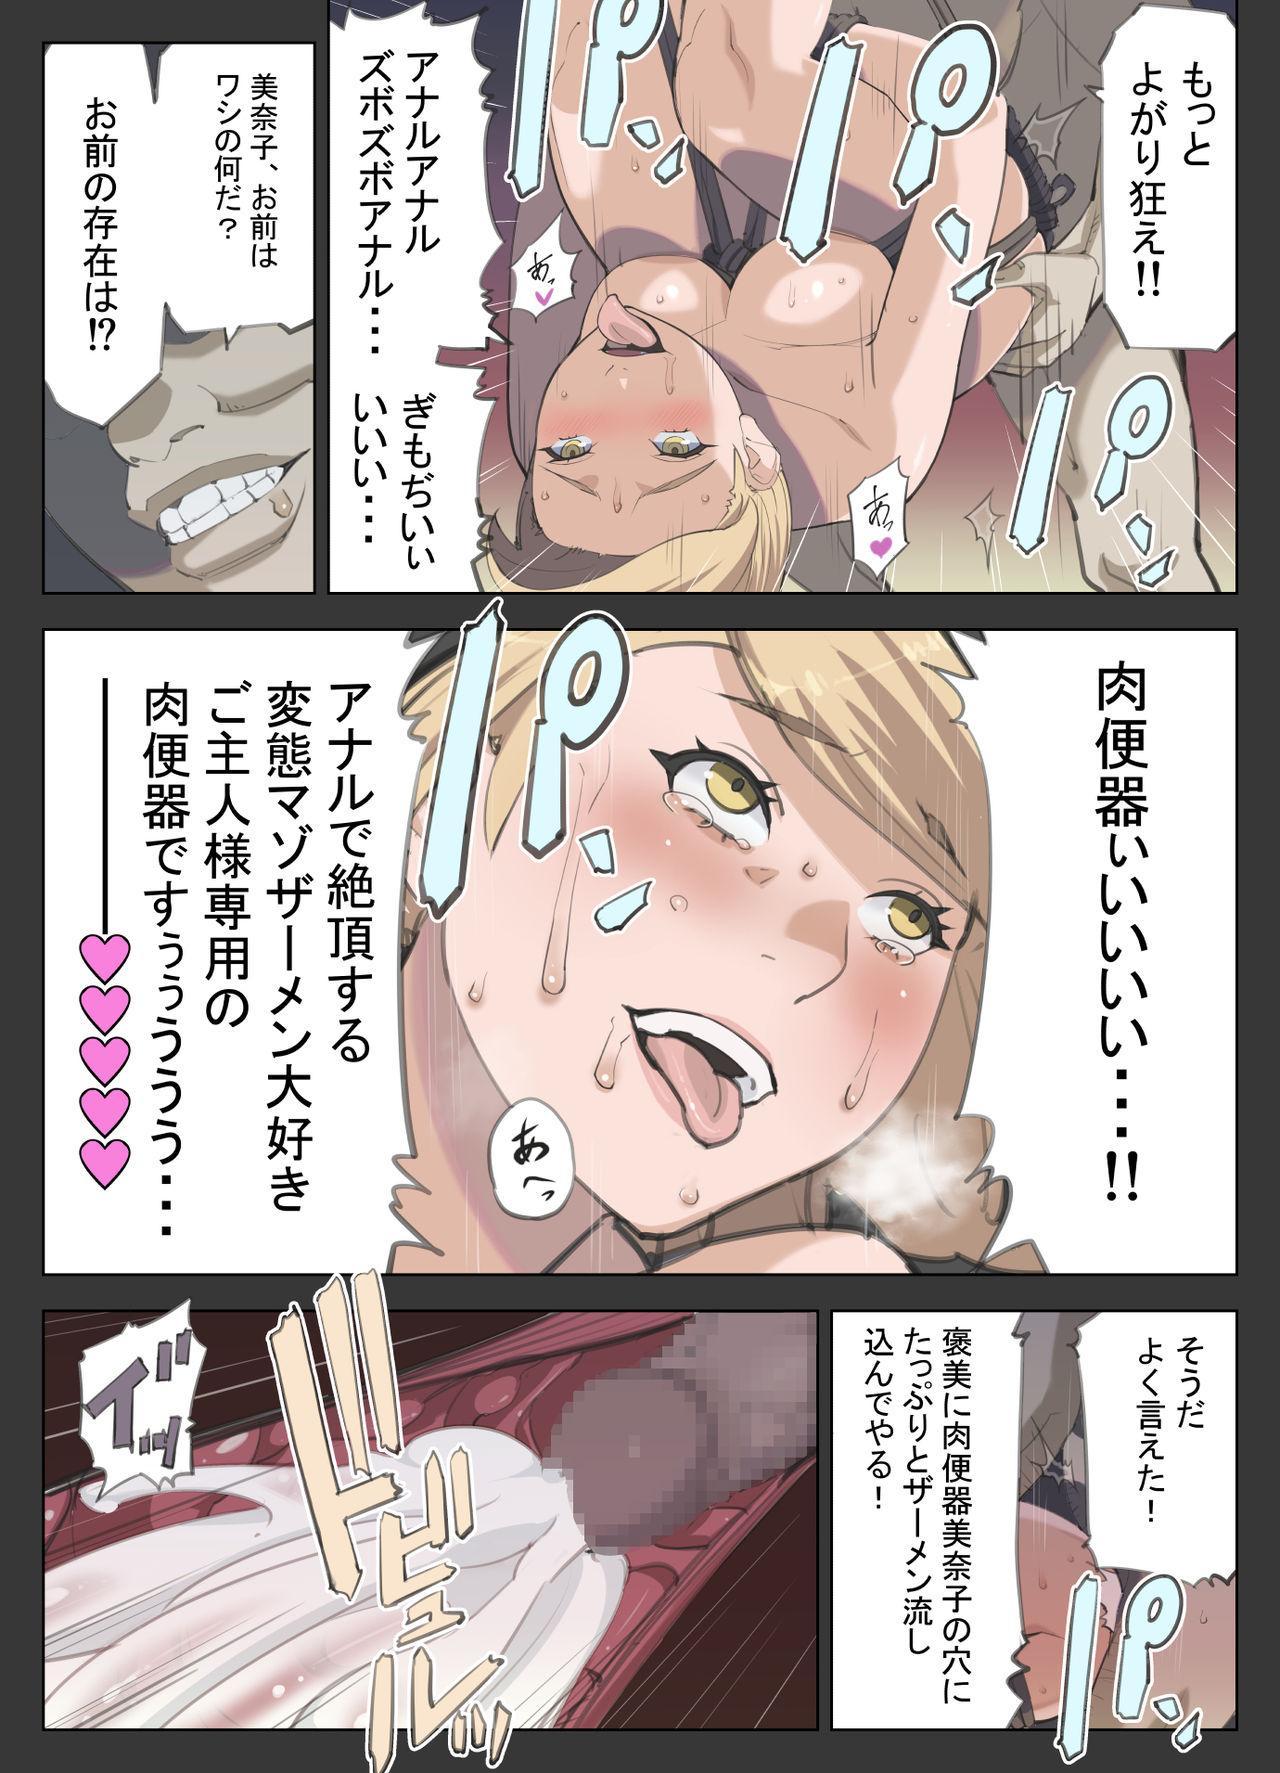 HoneTra + Omake 36